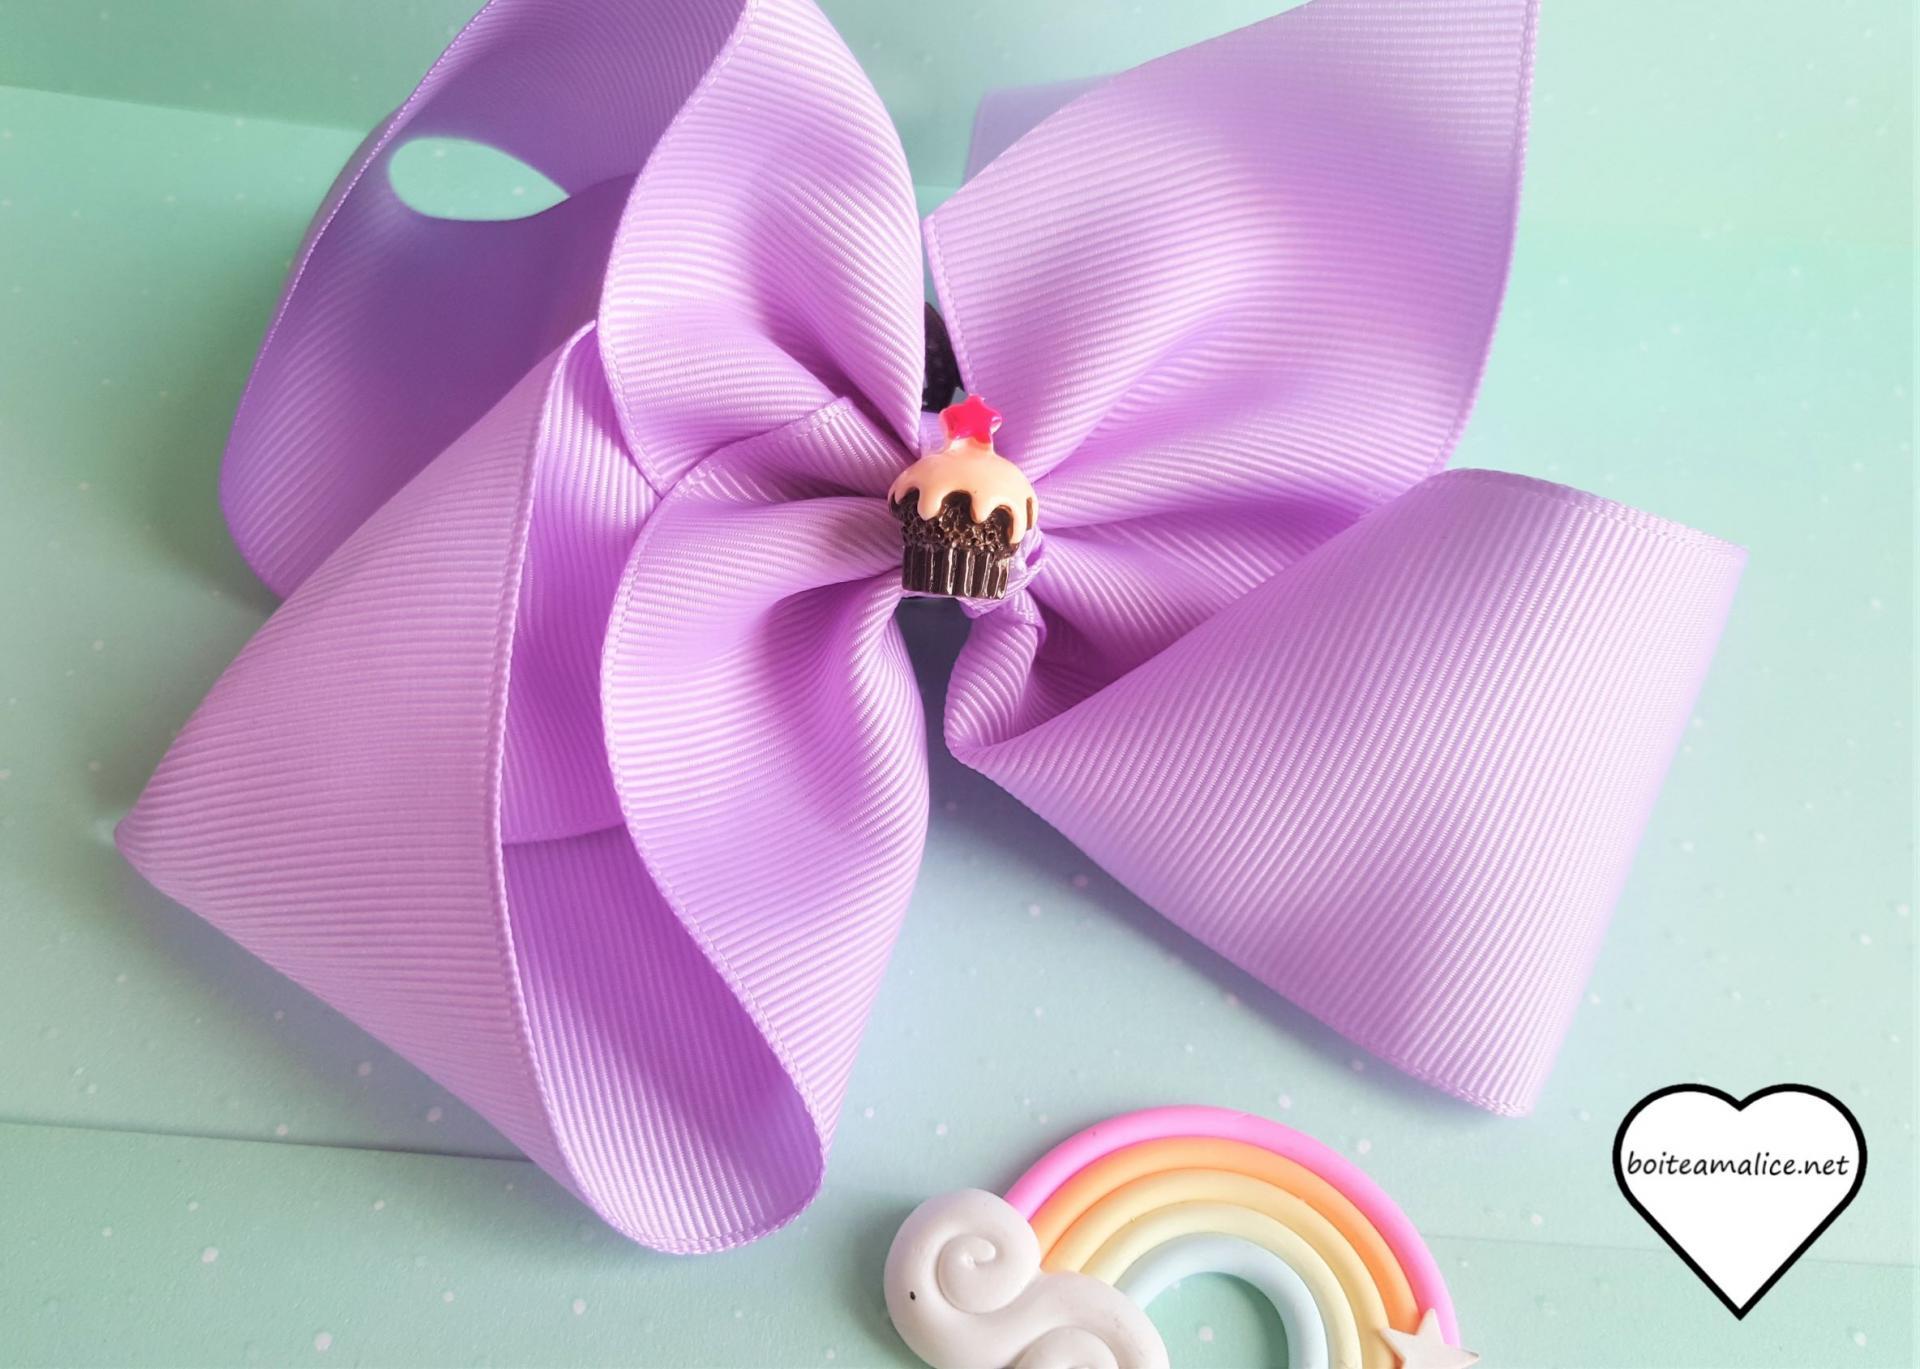 Accessoire lolita cup cake kawaii